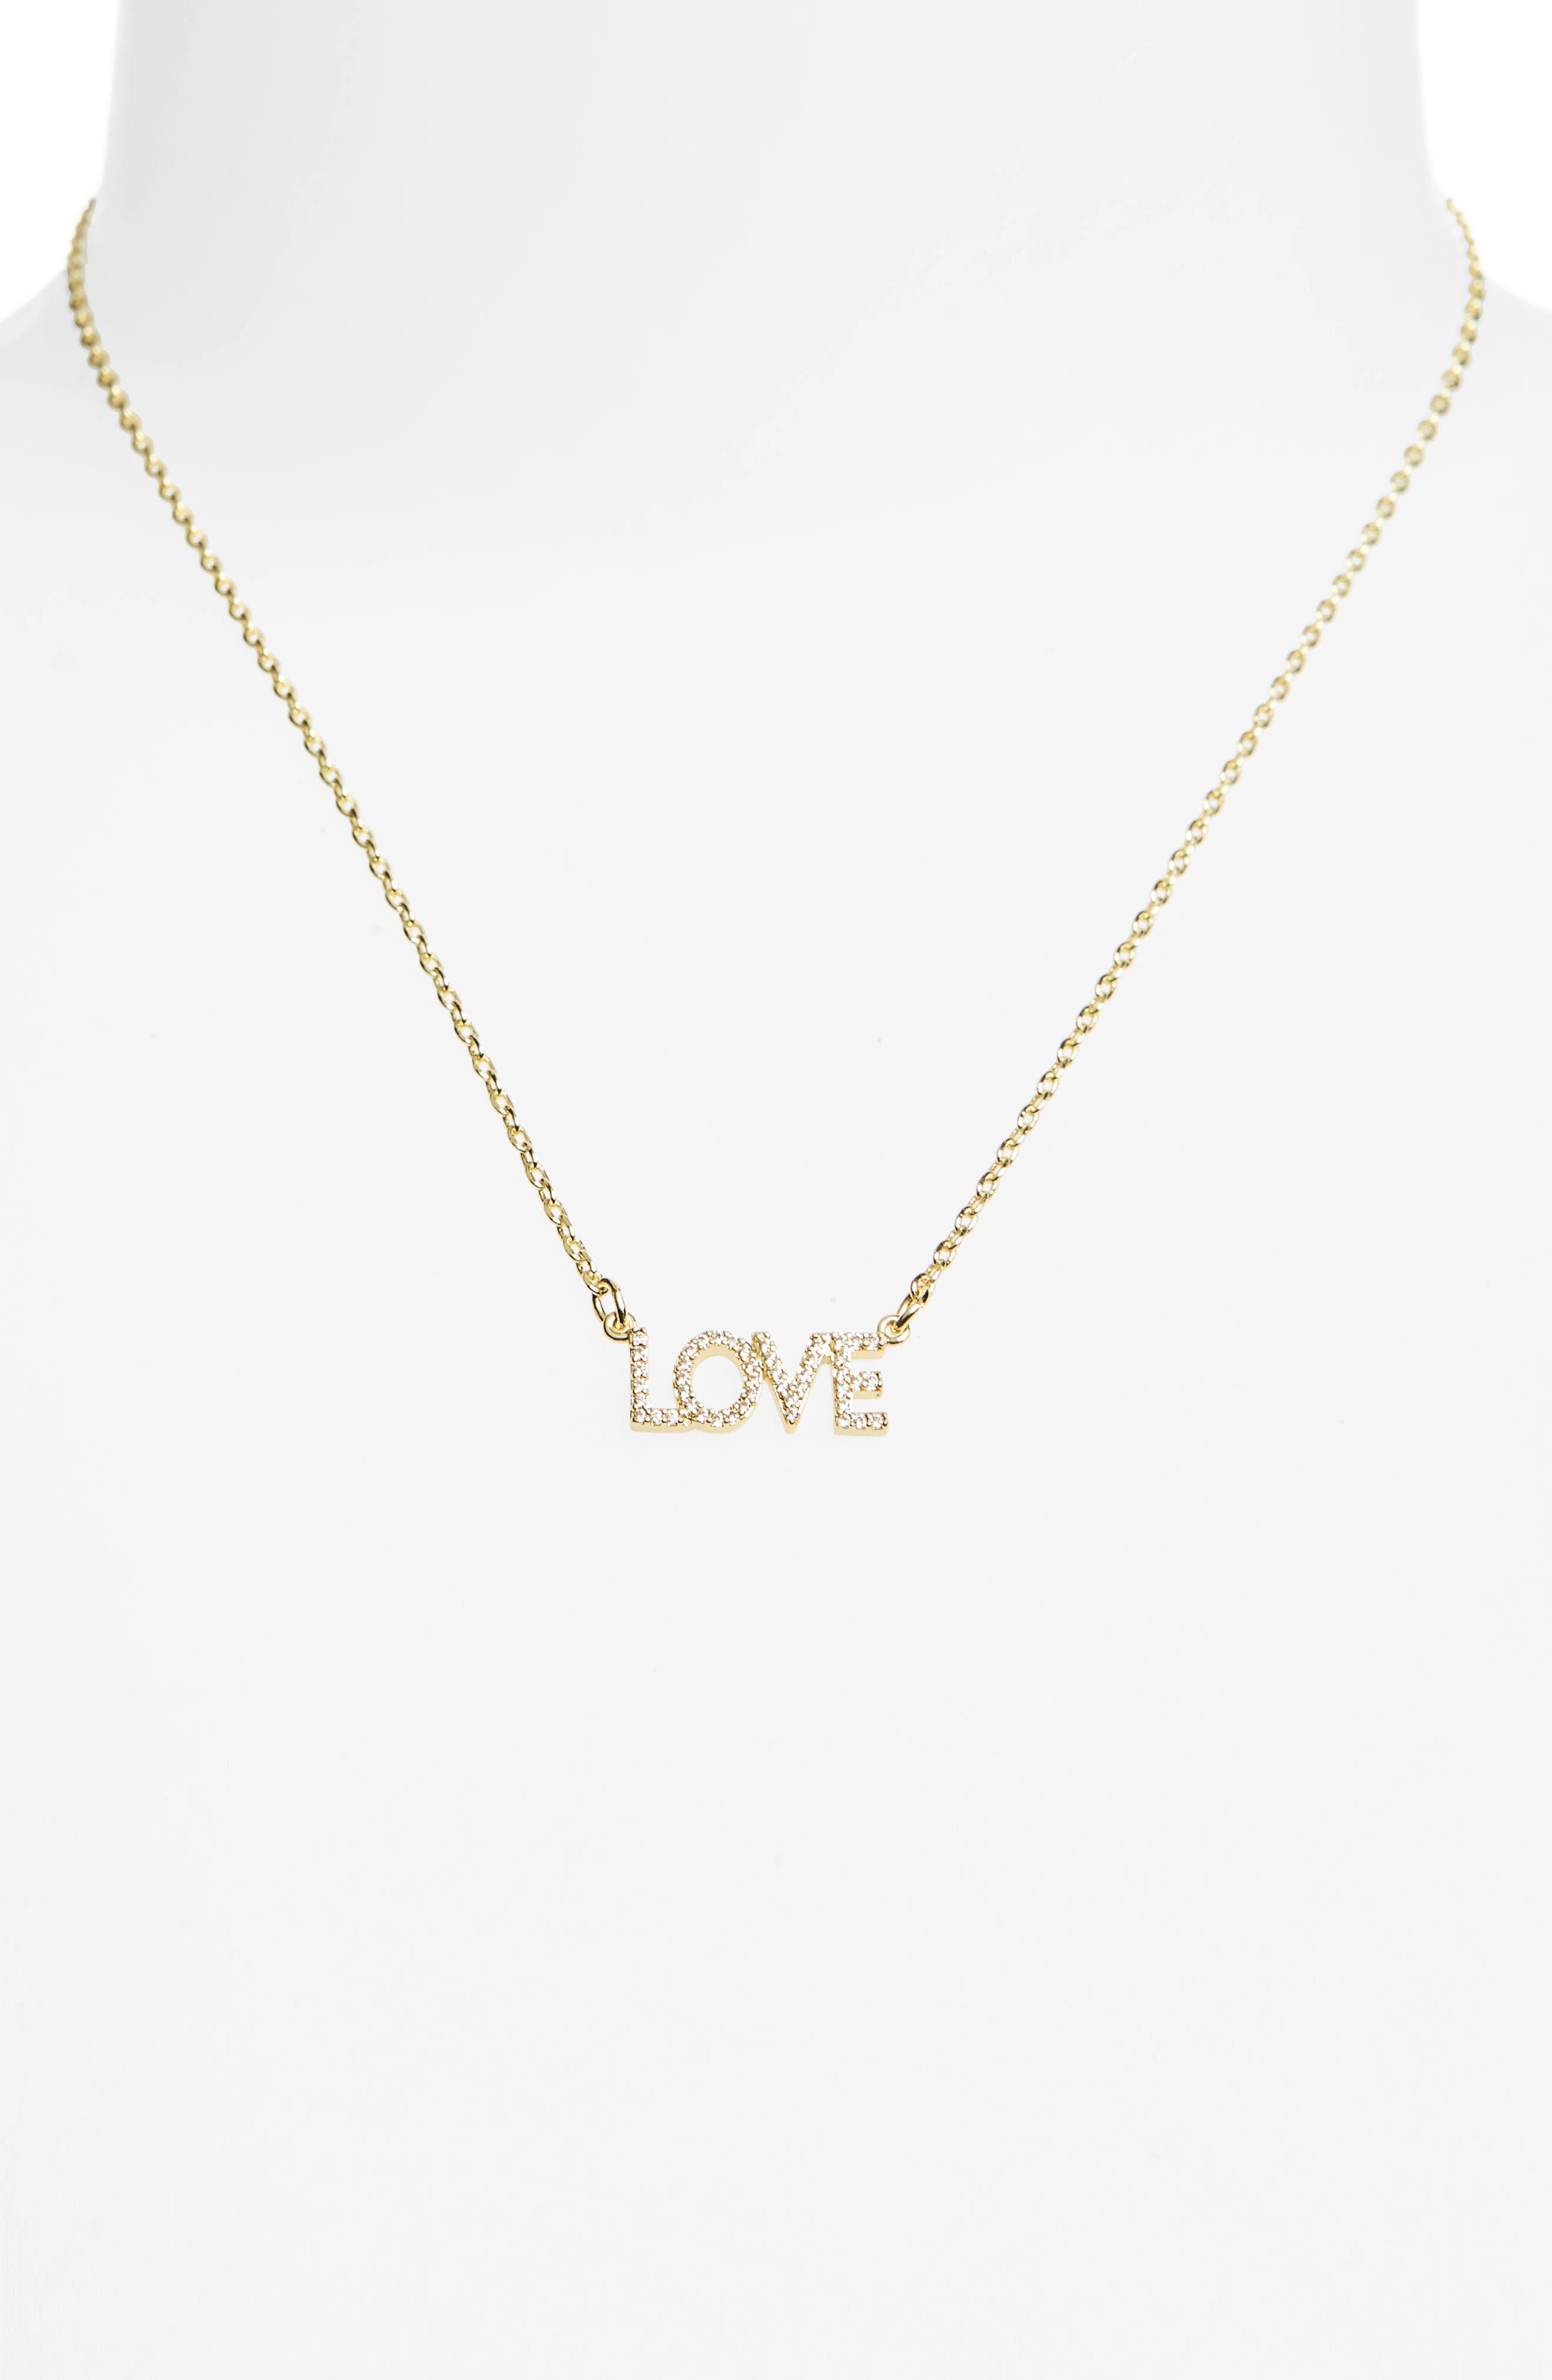 Love Necklace,                             Alternate thumbnail 2, color,                             710